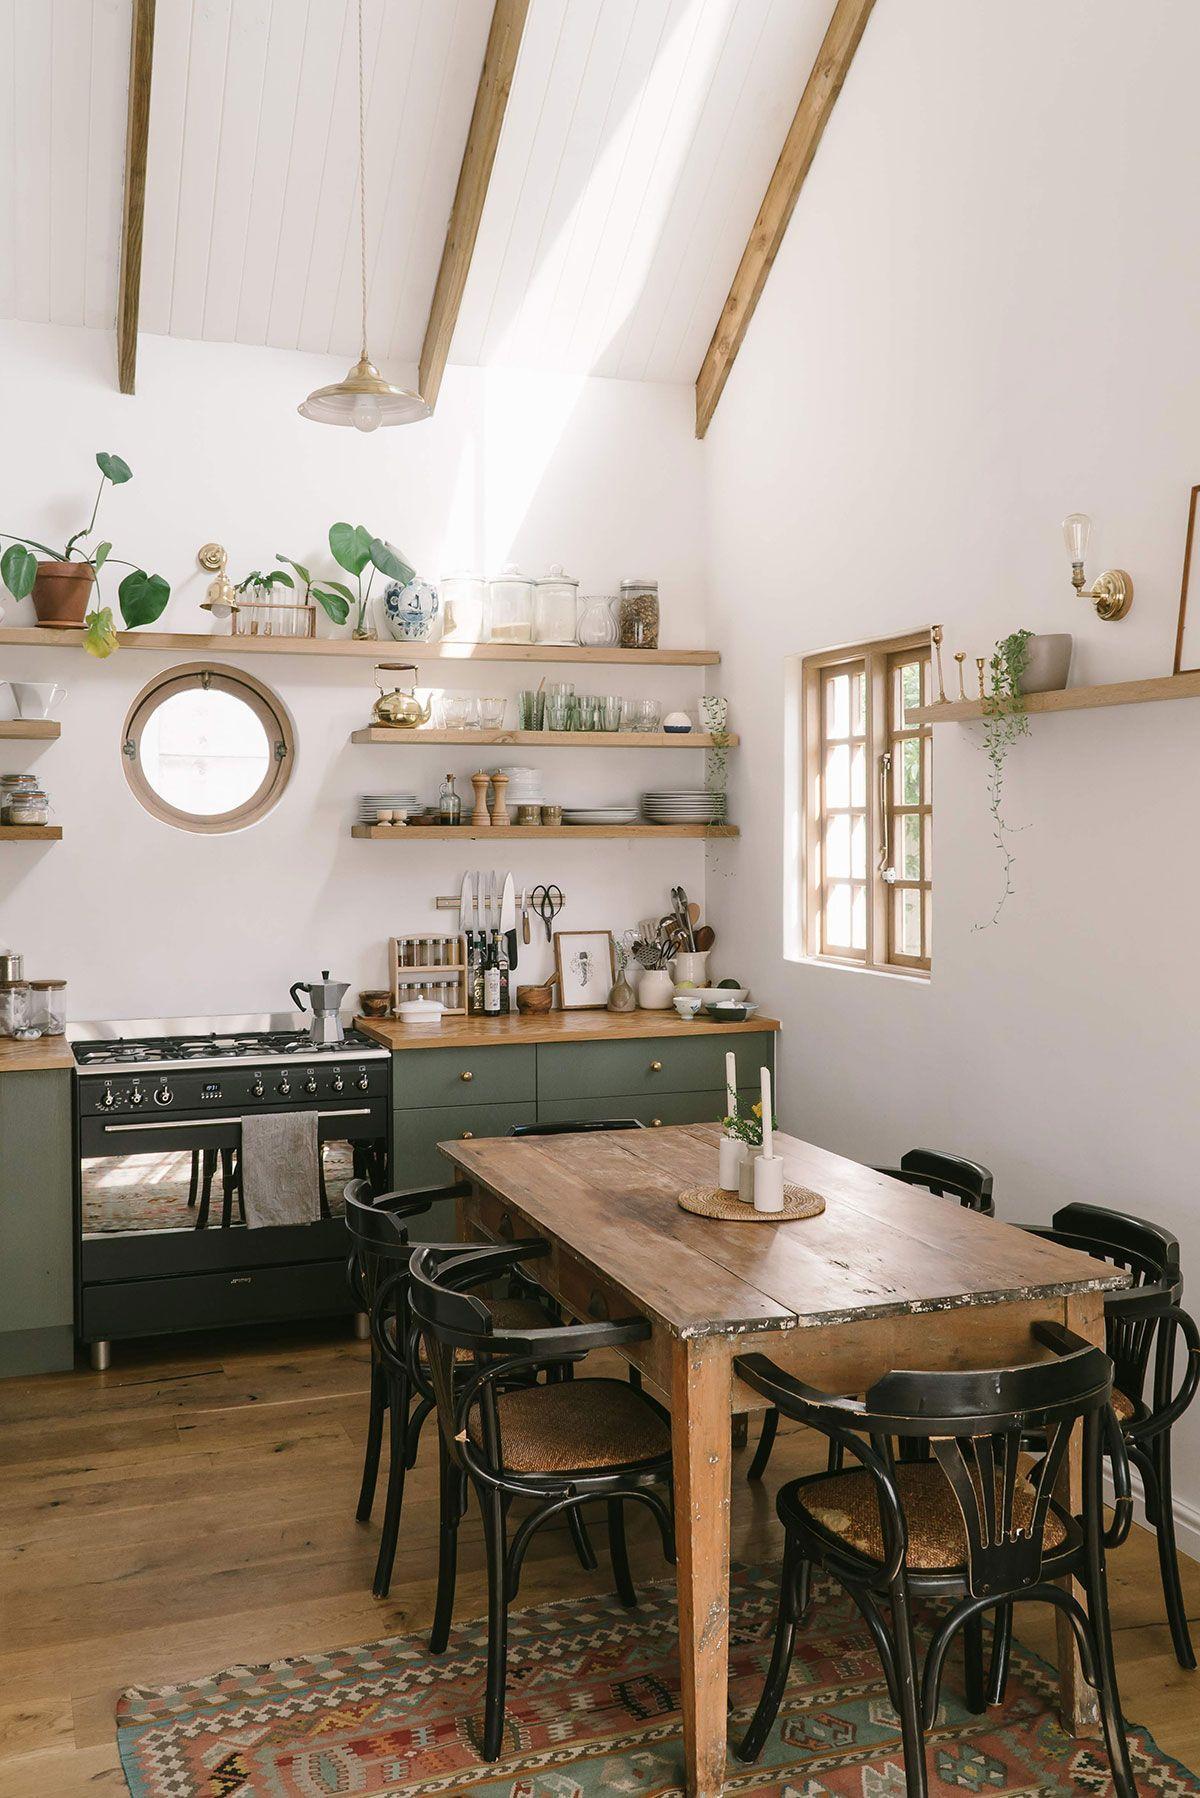 kitchen, wooden floor, wooden dining set, black wooden chairs, white wall, wooden open shelves, green bottom cabinet, wooden counter top, window